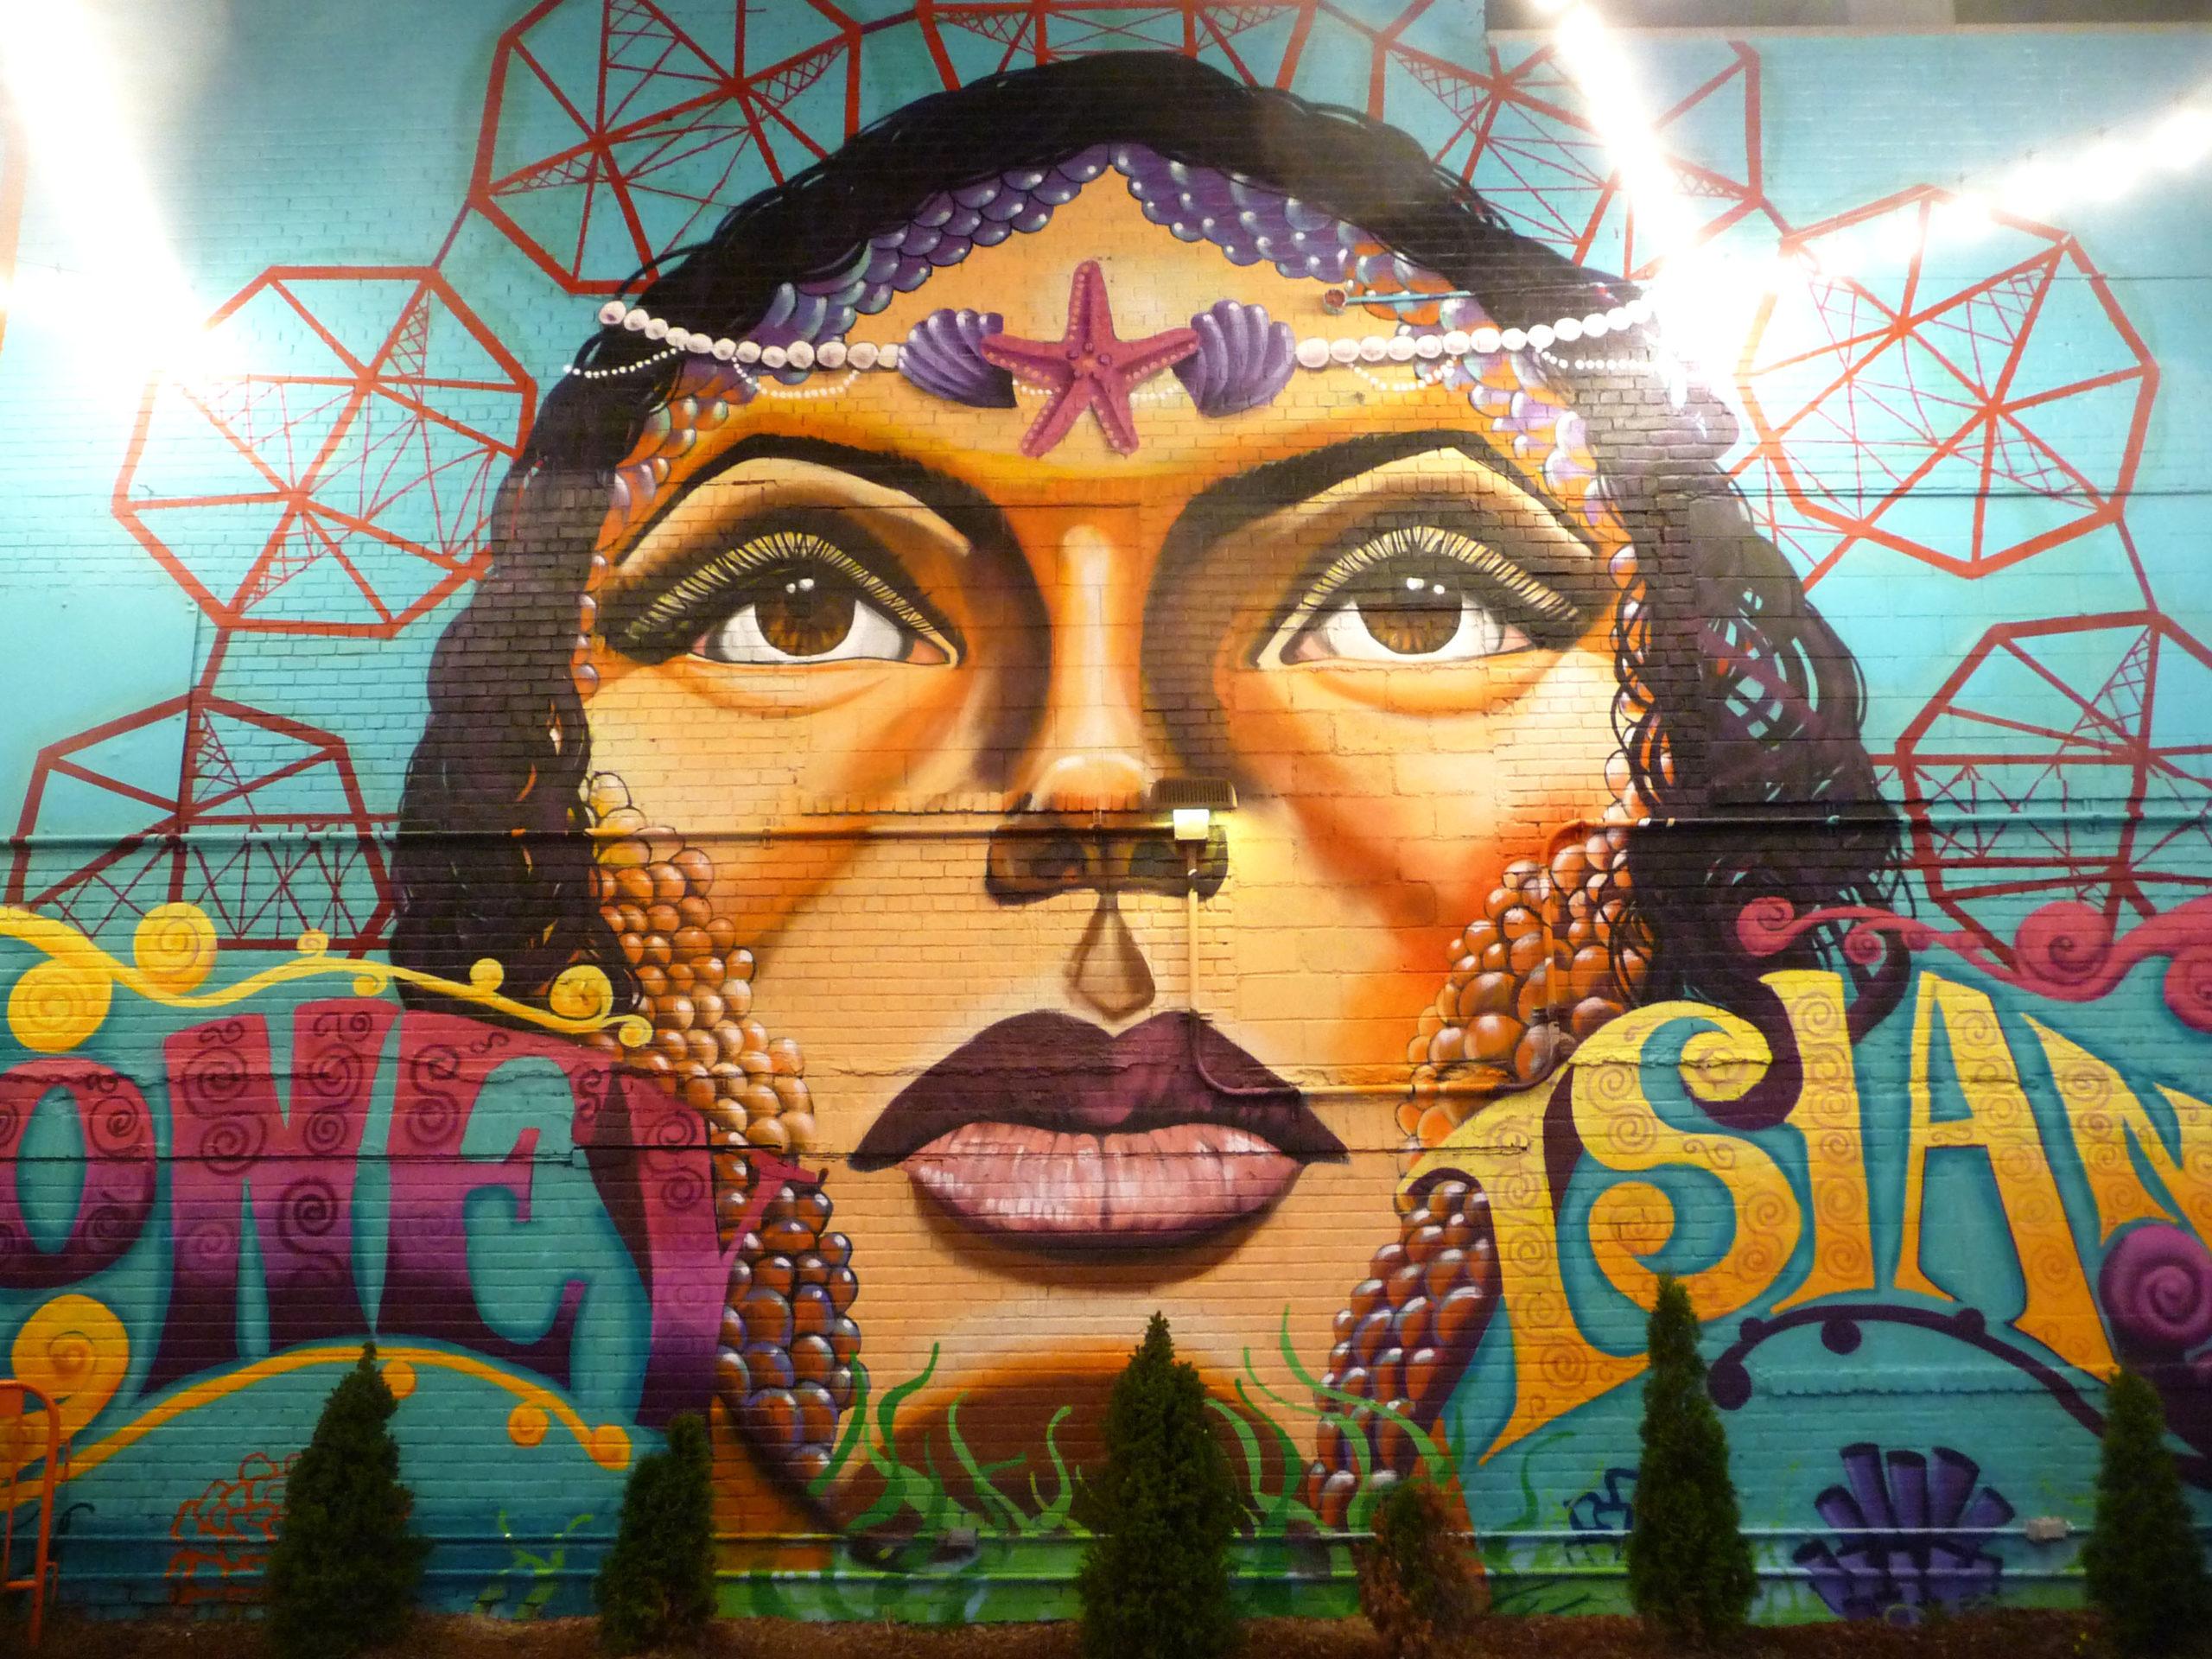 Street-art Coney Island, Danielle Mastrion